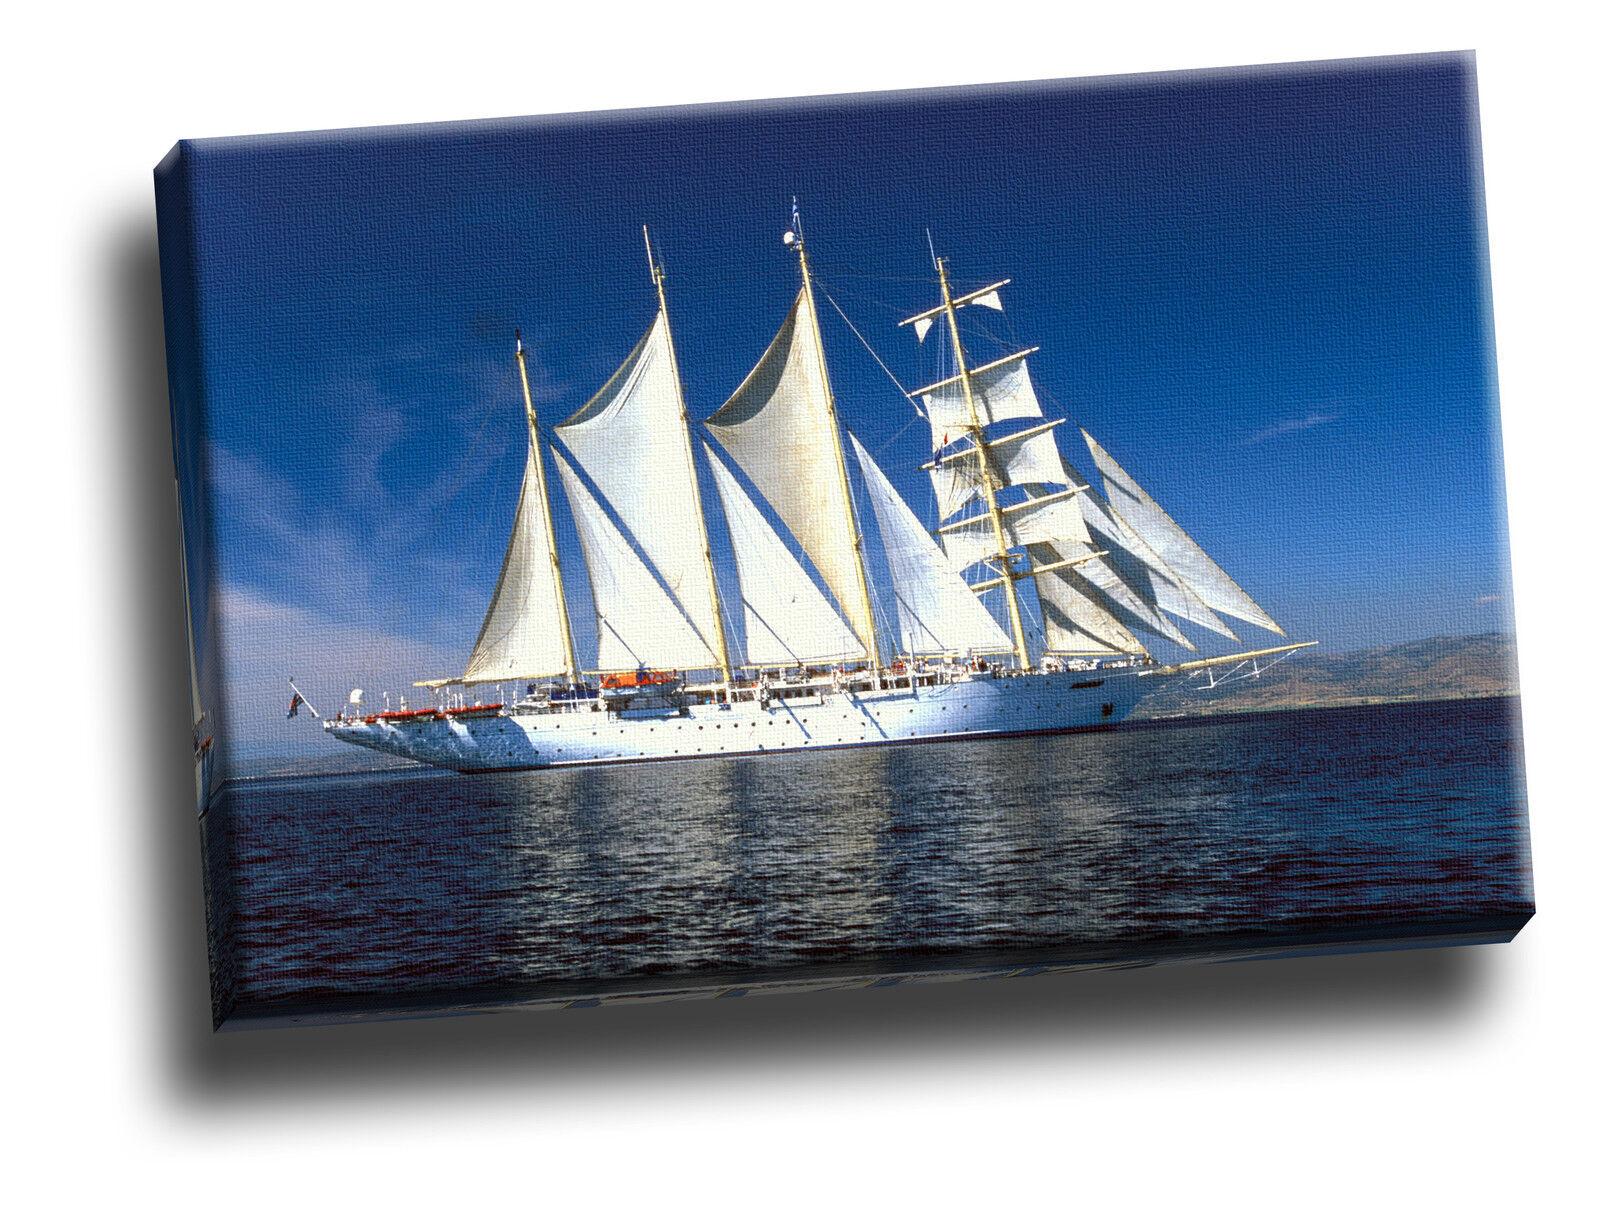 Star Flyer Boat Boat Boat Aegean Sea Turkey Giclee Canvas Seascape Picture Art b1282b